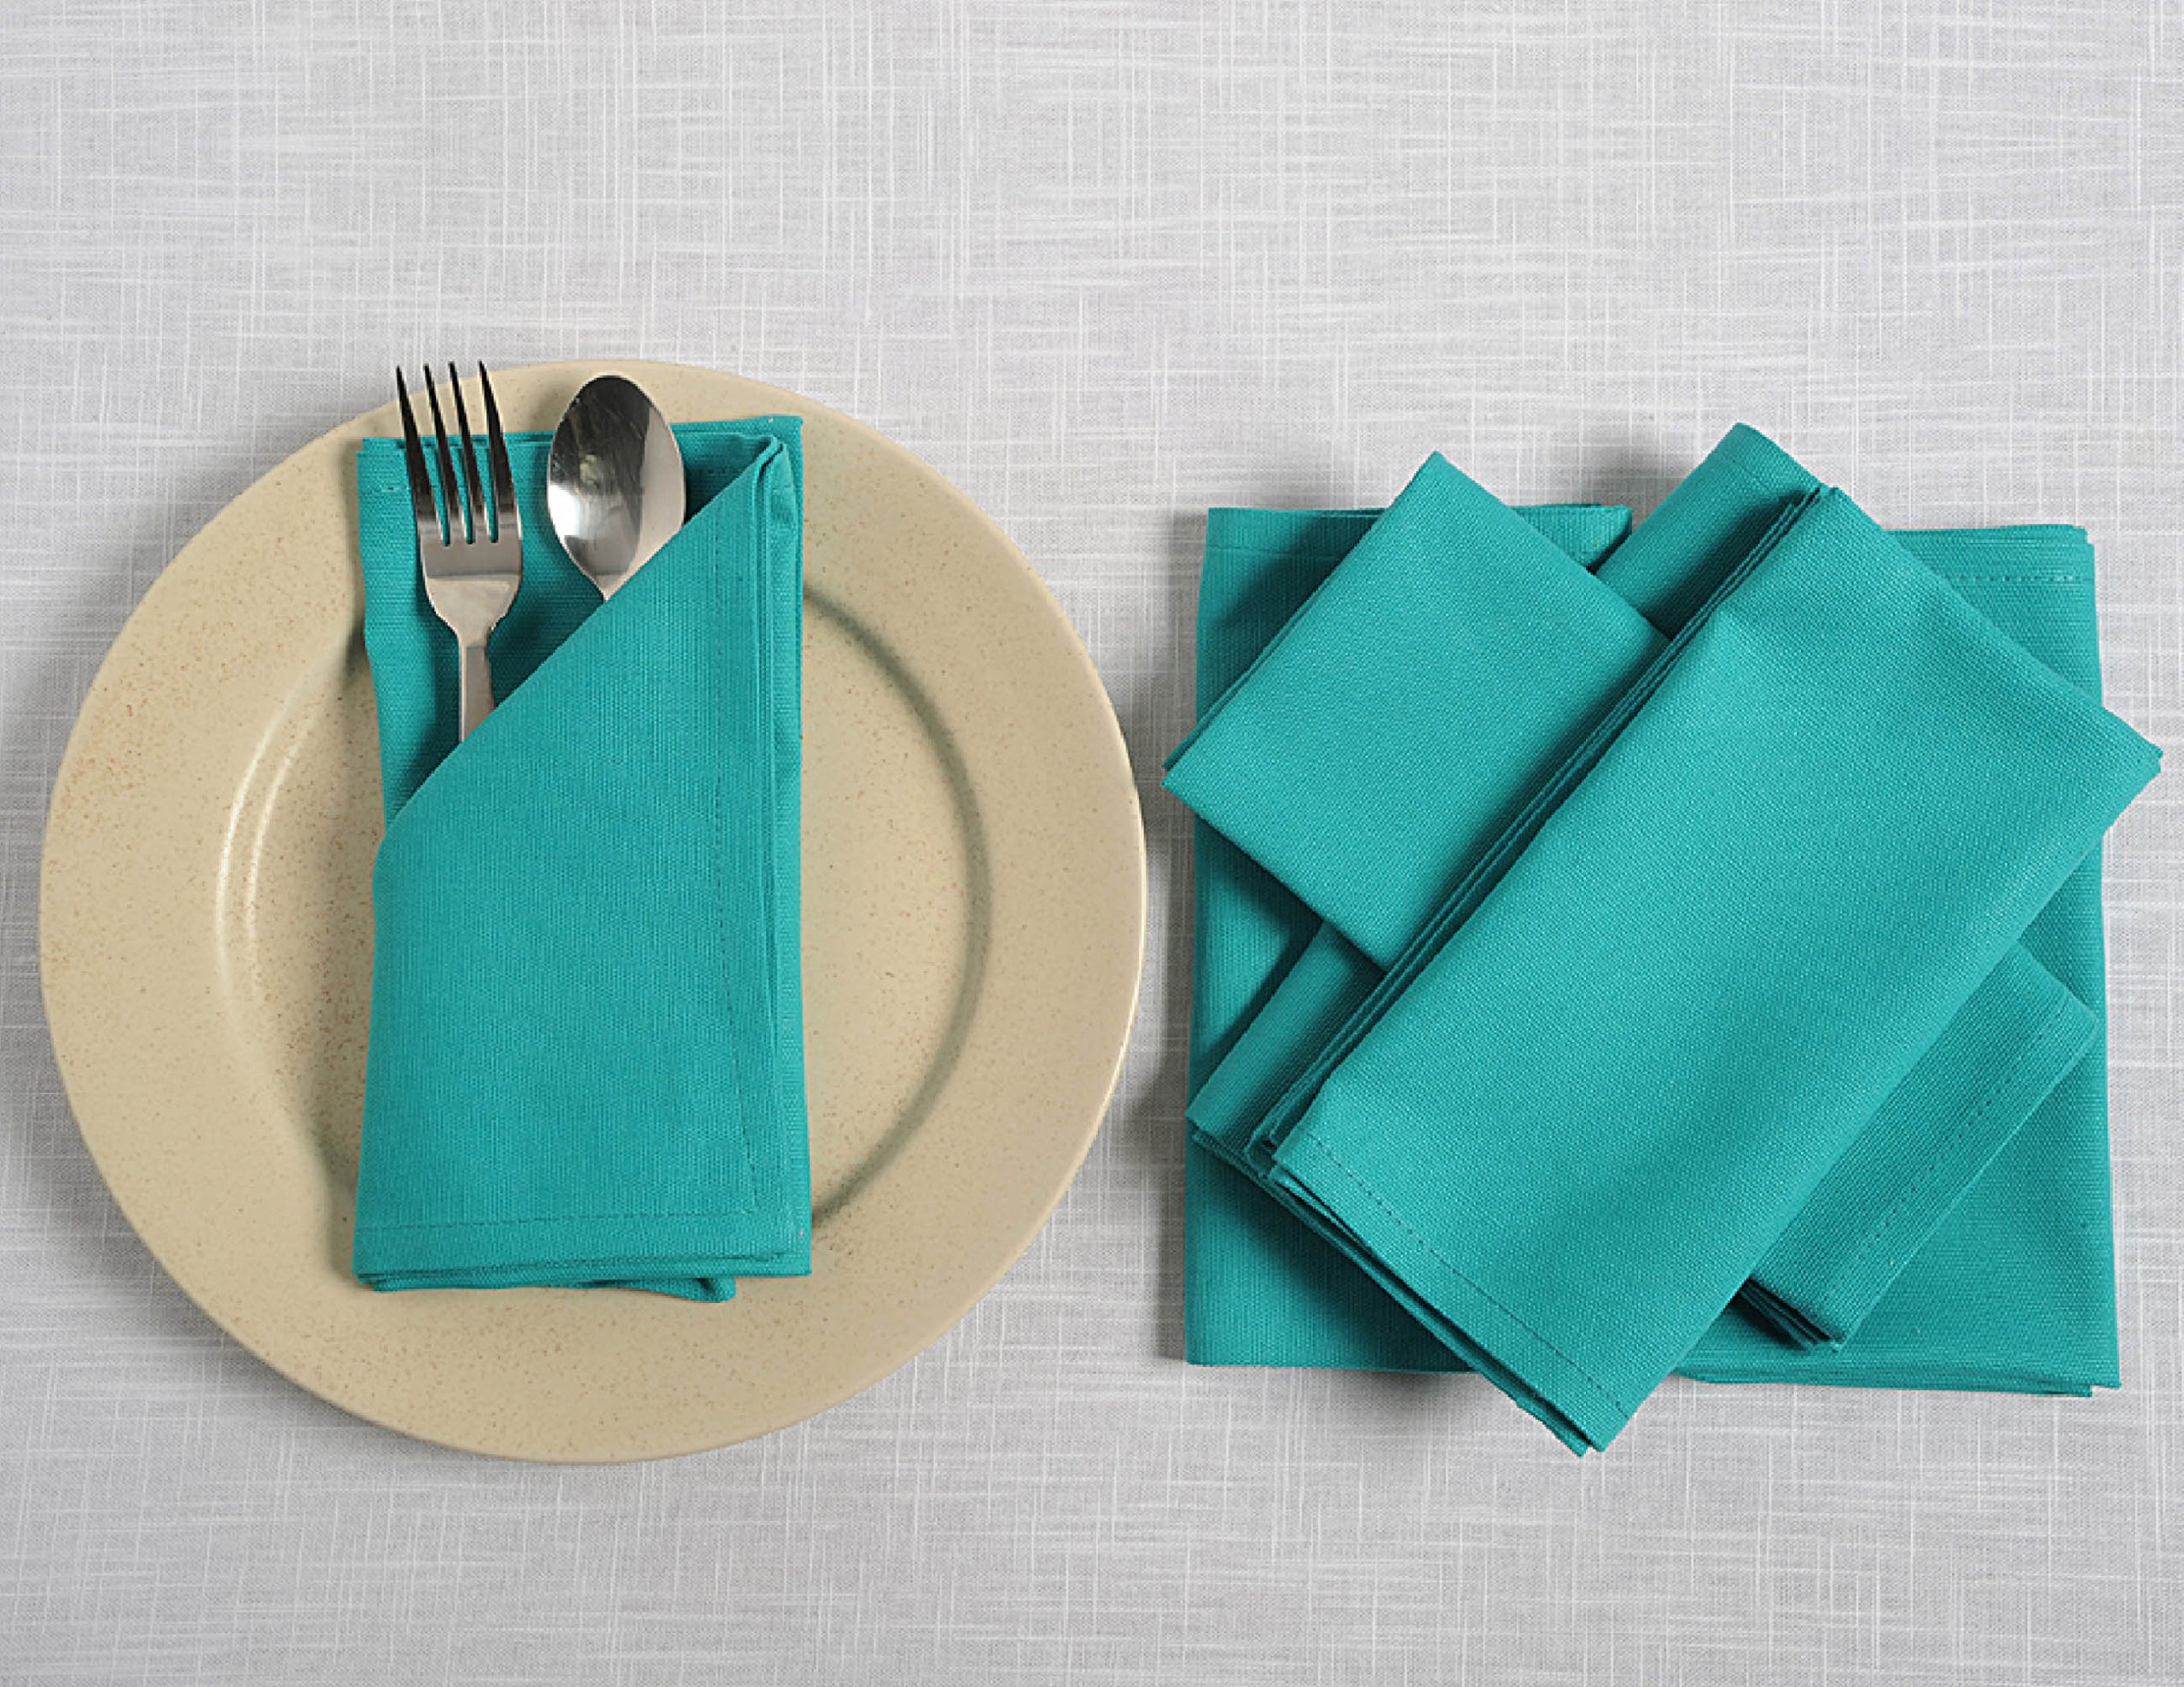 ShalinIndia Cloth Napkins Set For Lunch - 18'' x 18'' - Cotton - Aqua - Set of 12 - Perfect for Weddings & Parties by ShalinIndia